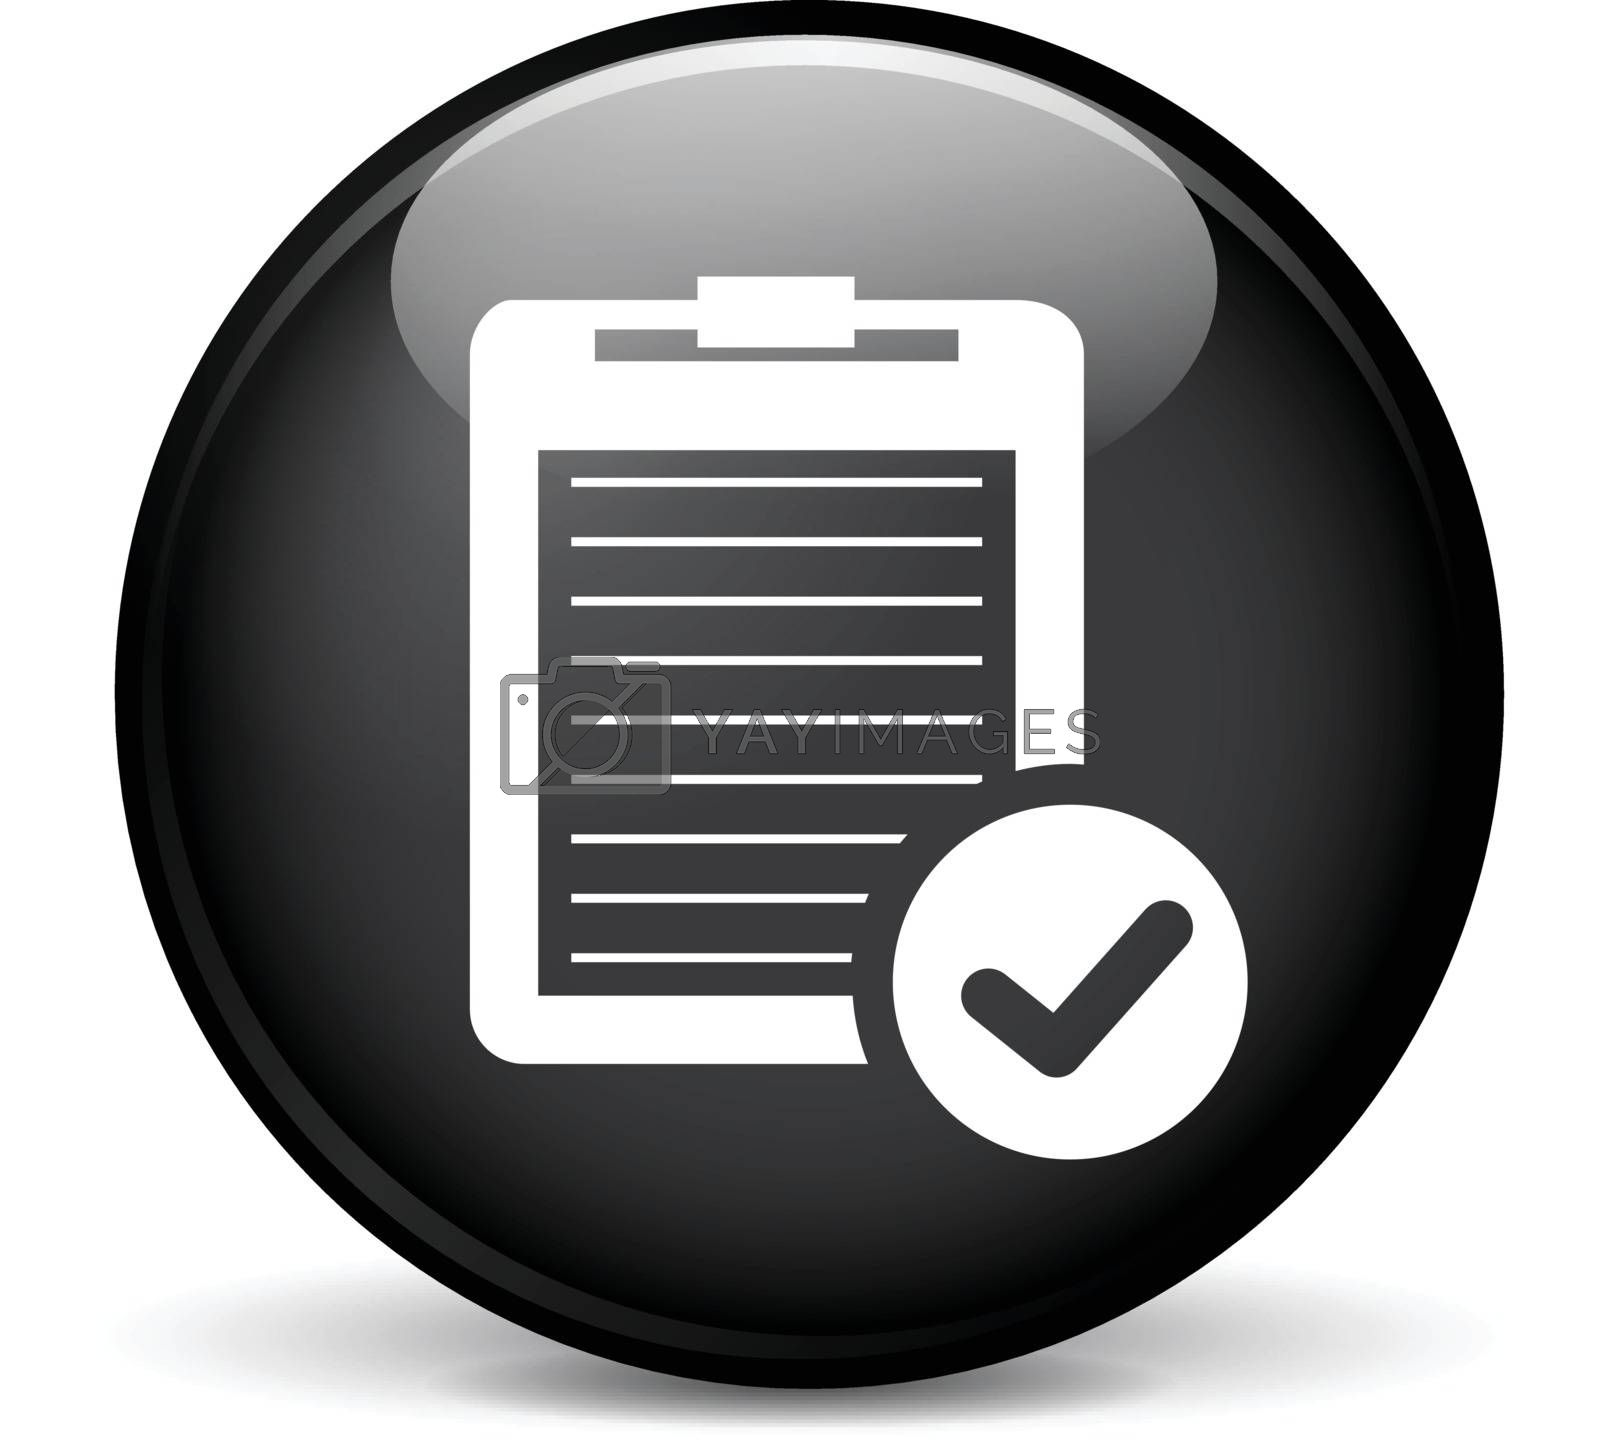 Illustration of report modern design black sphere icon